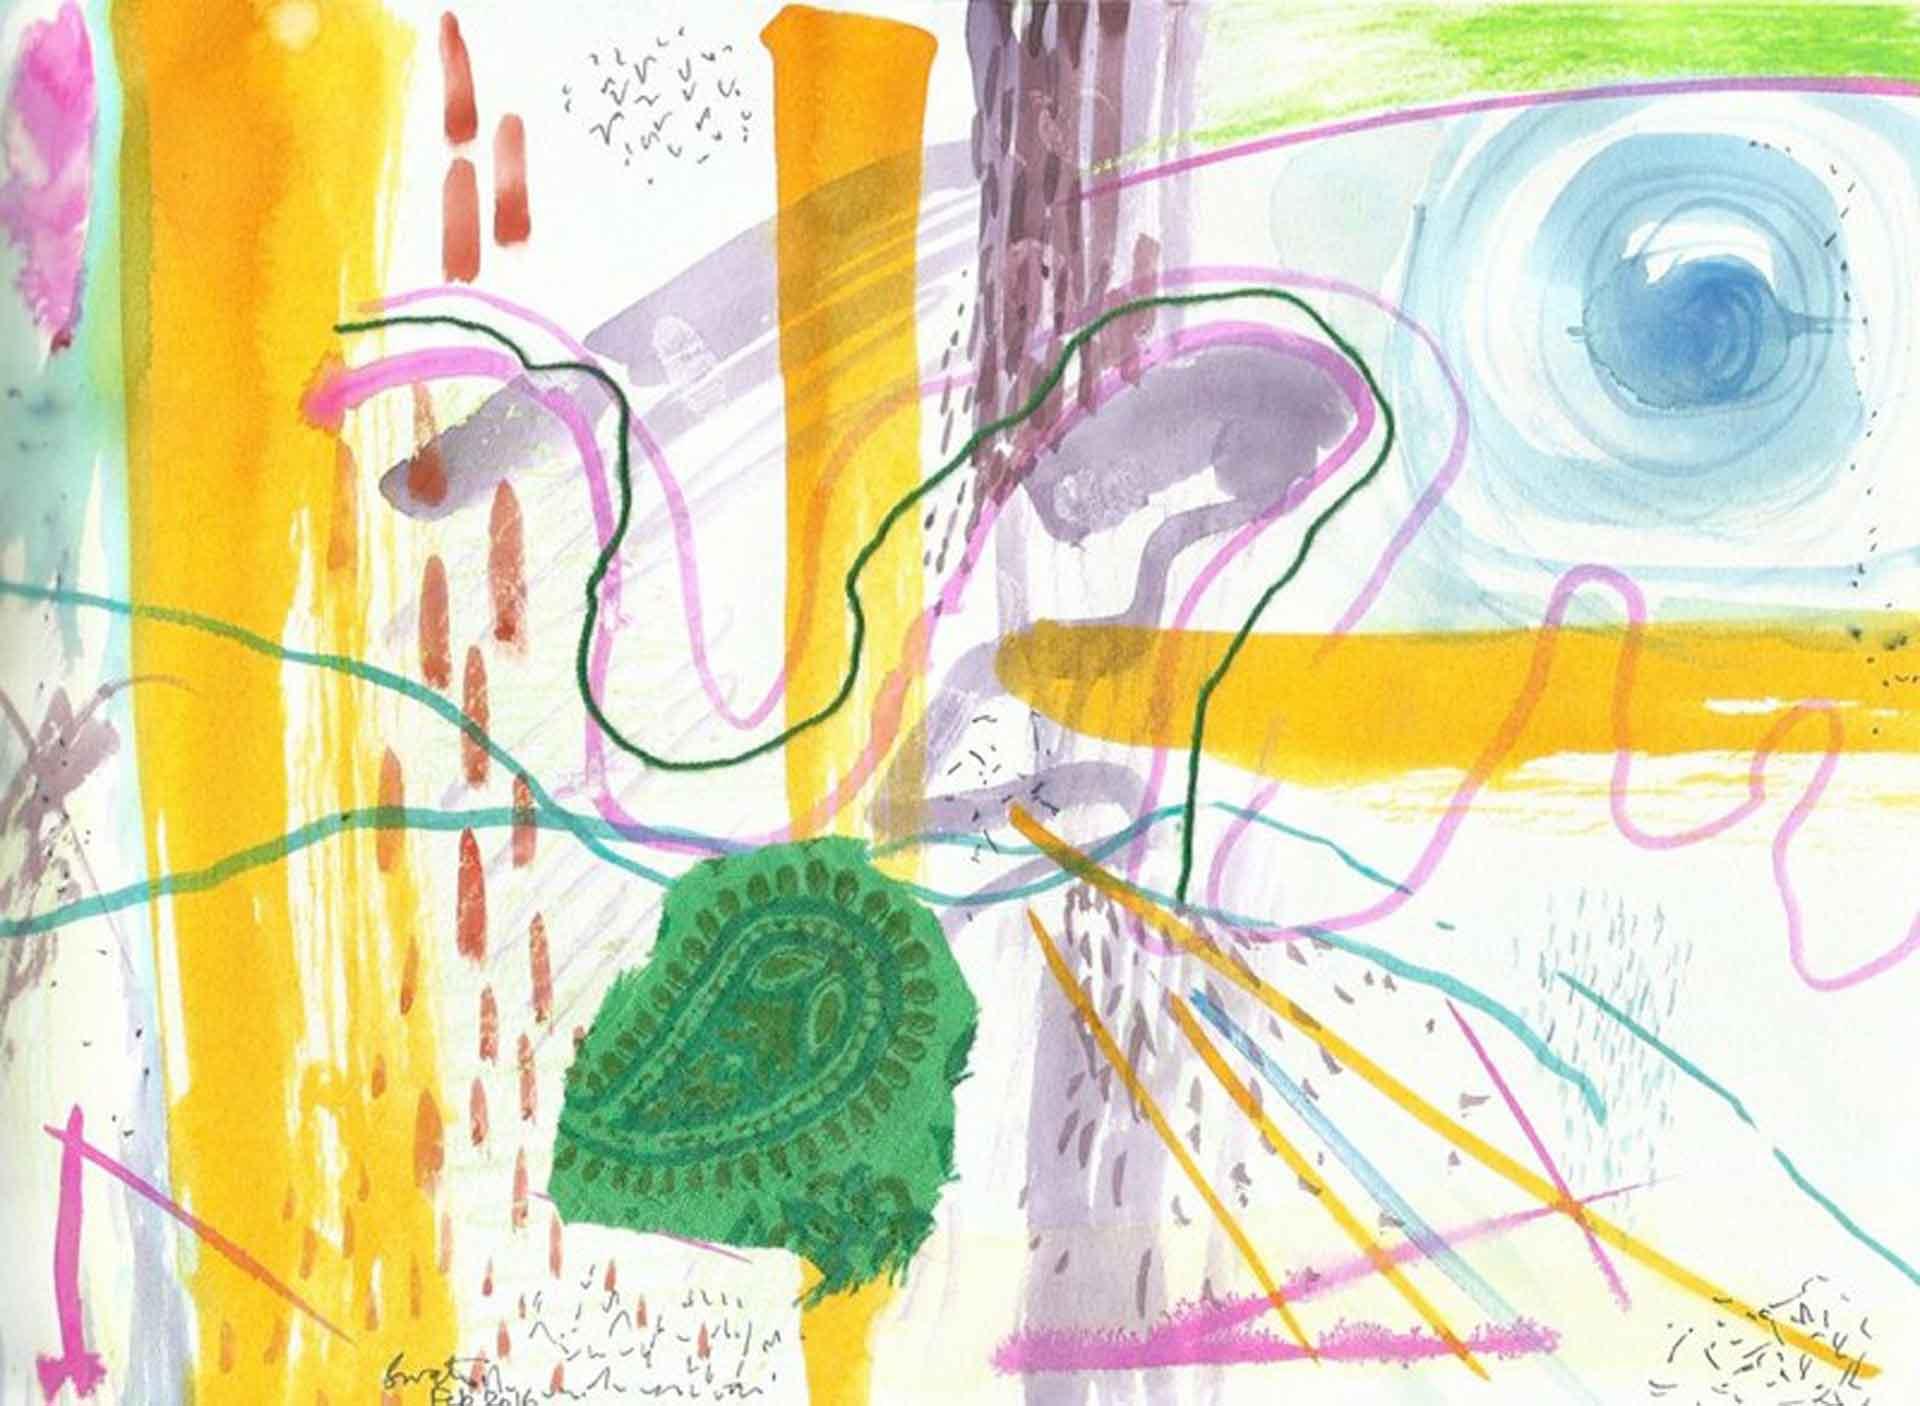 swati gupta gouache adorn arts and society